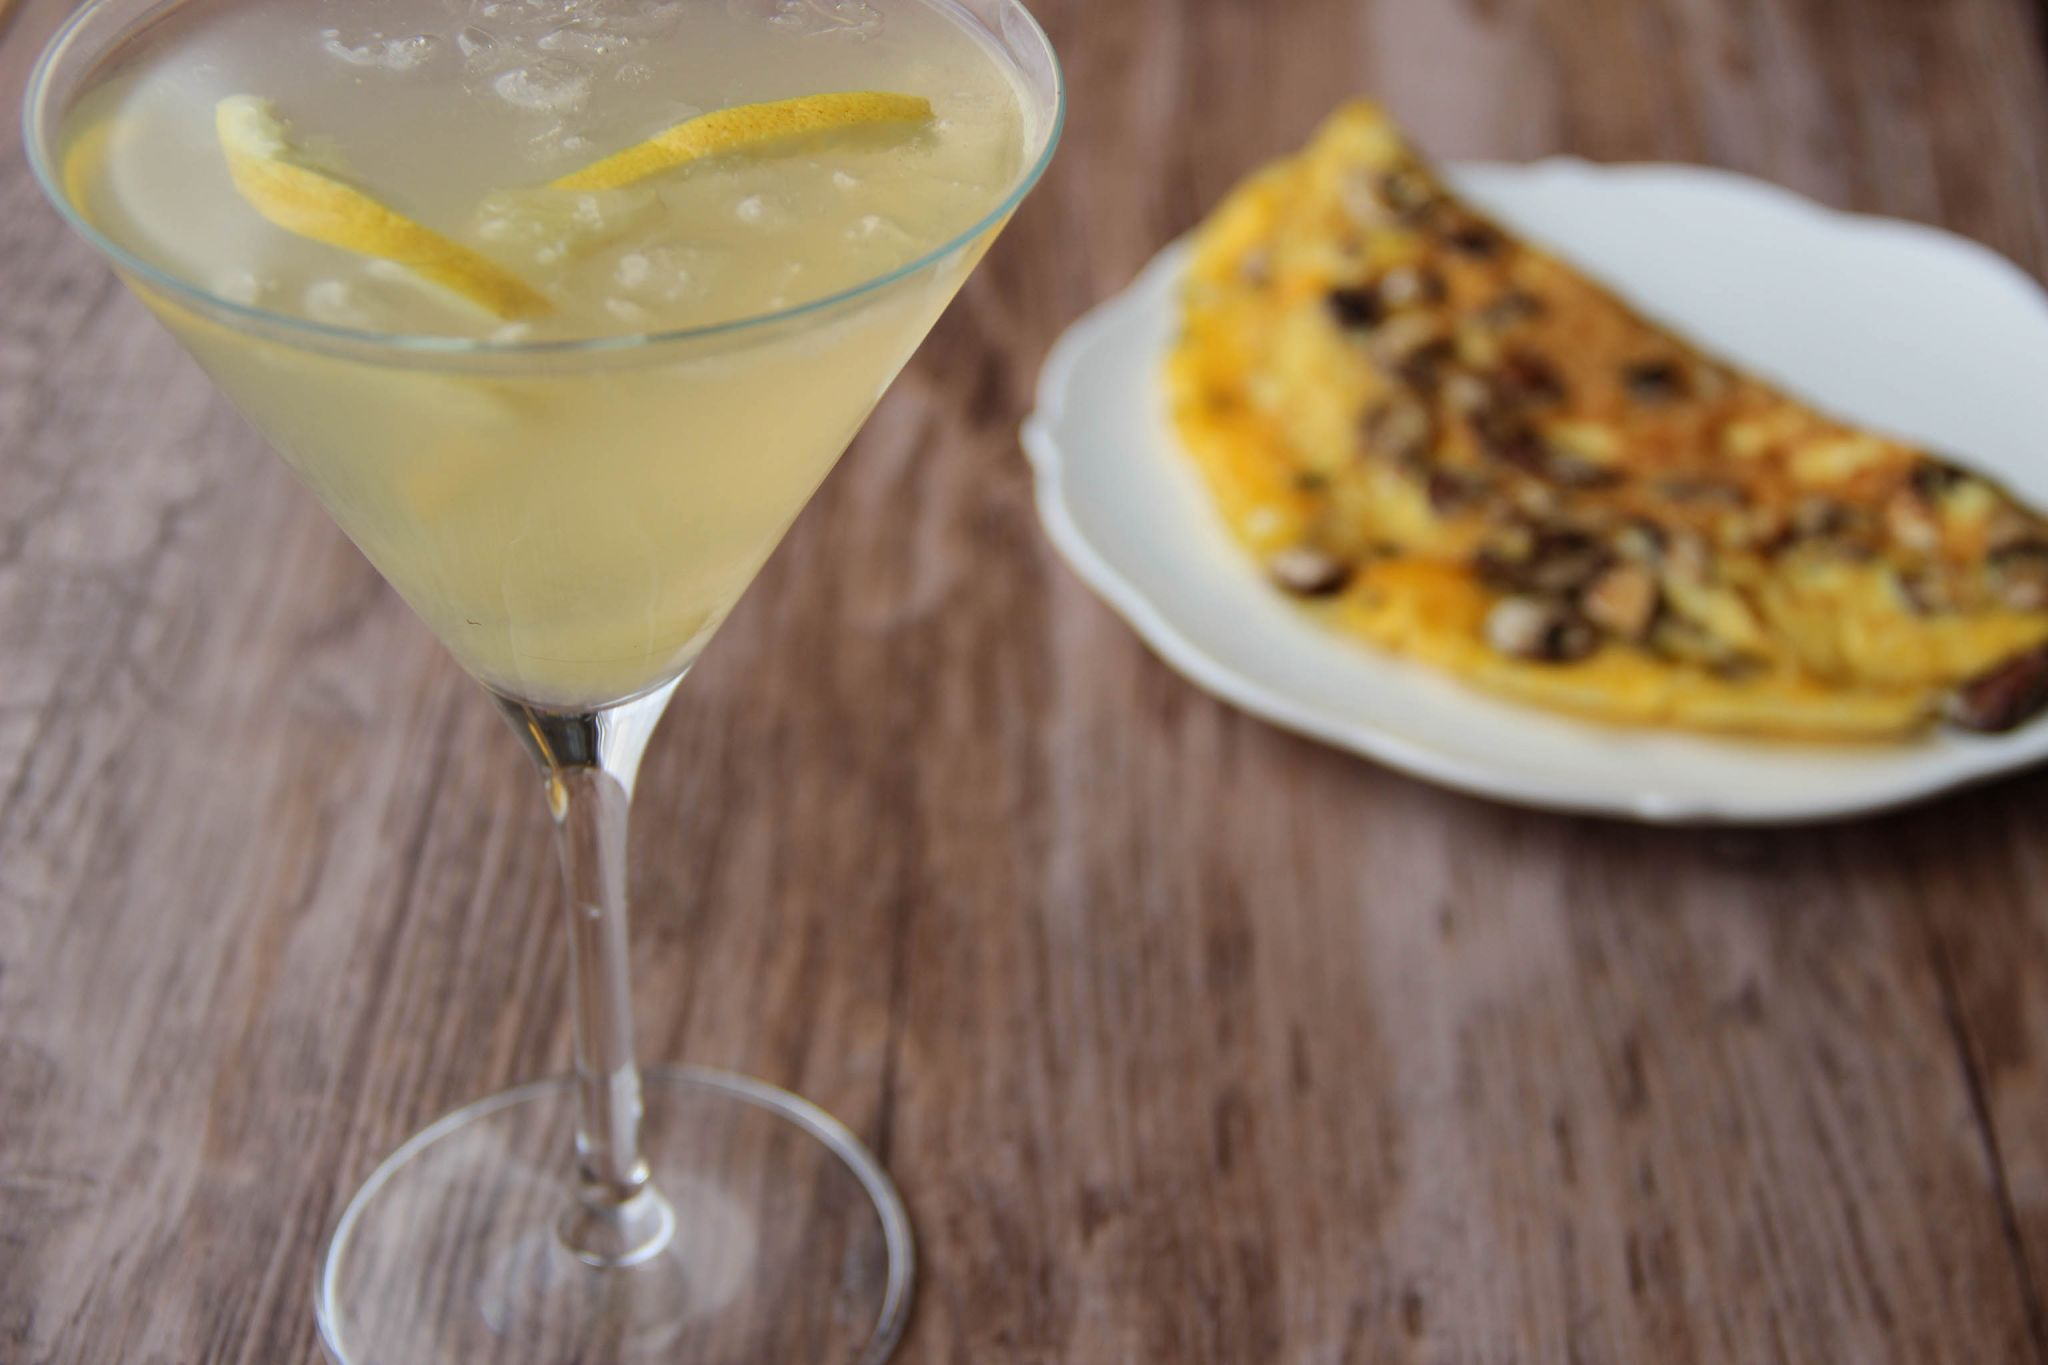 Honey bee cocktail and mushroom omelette